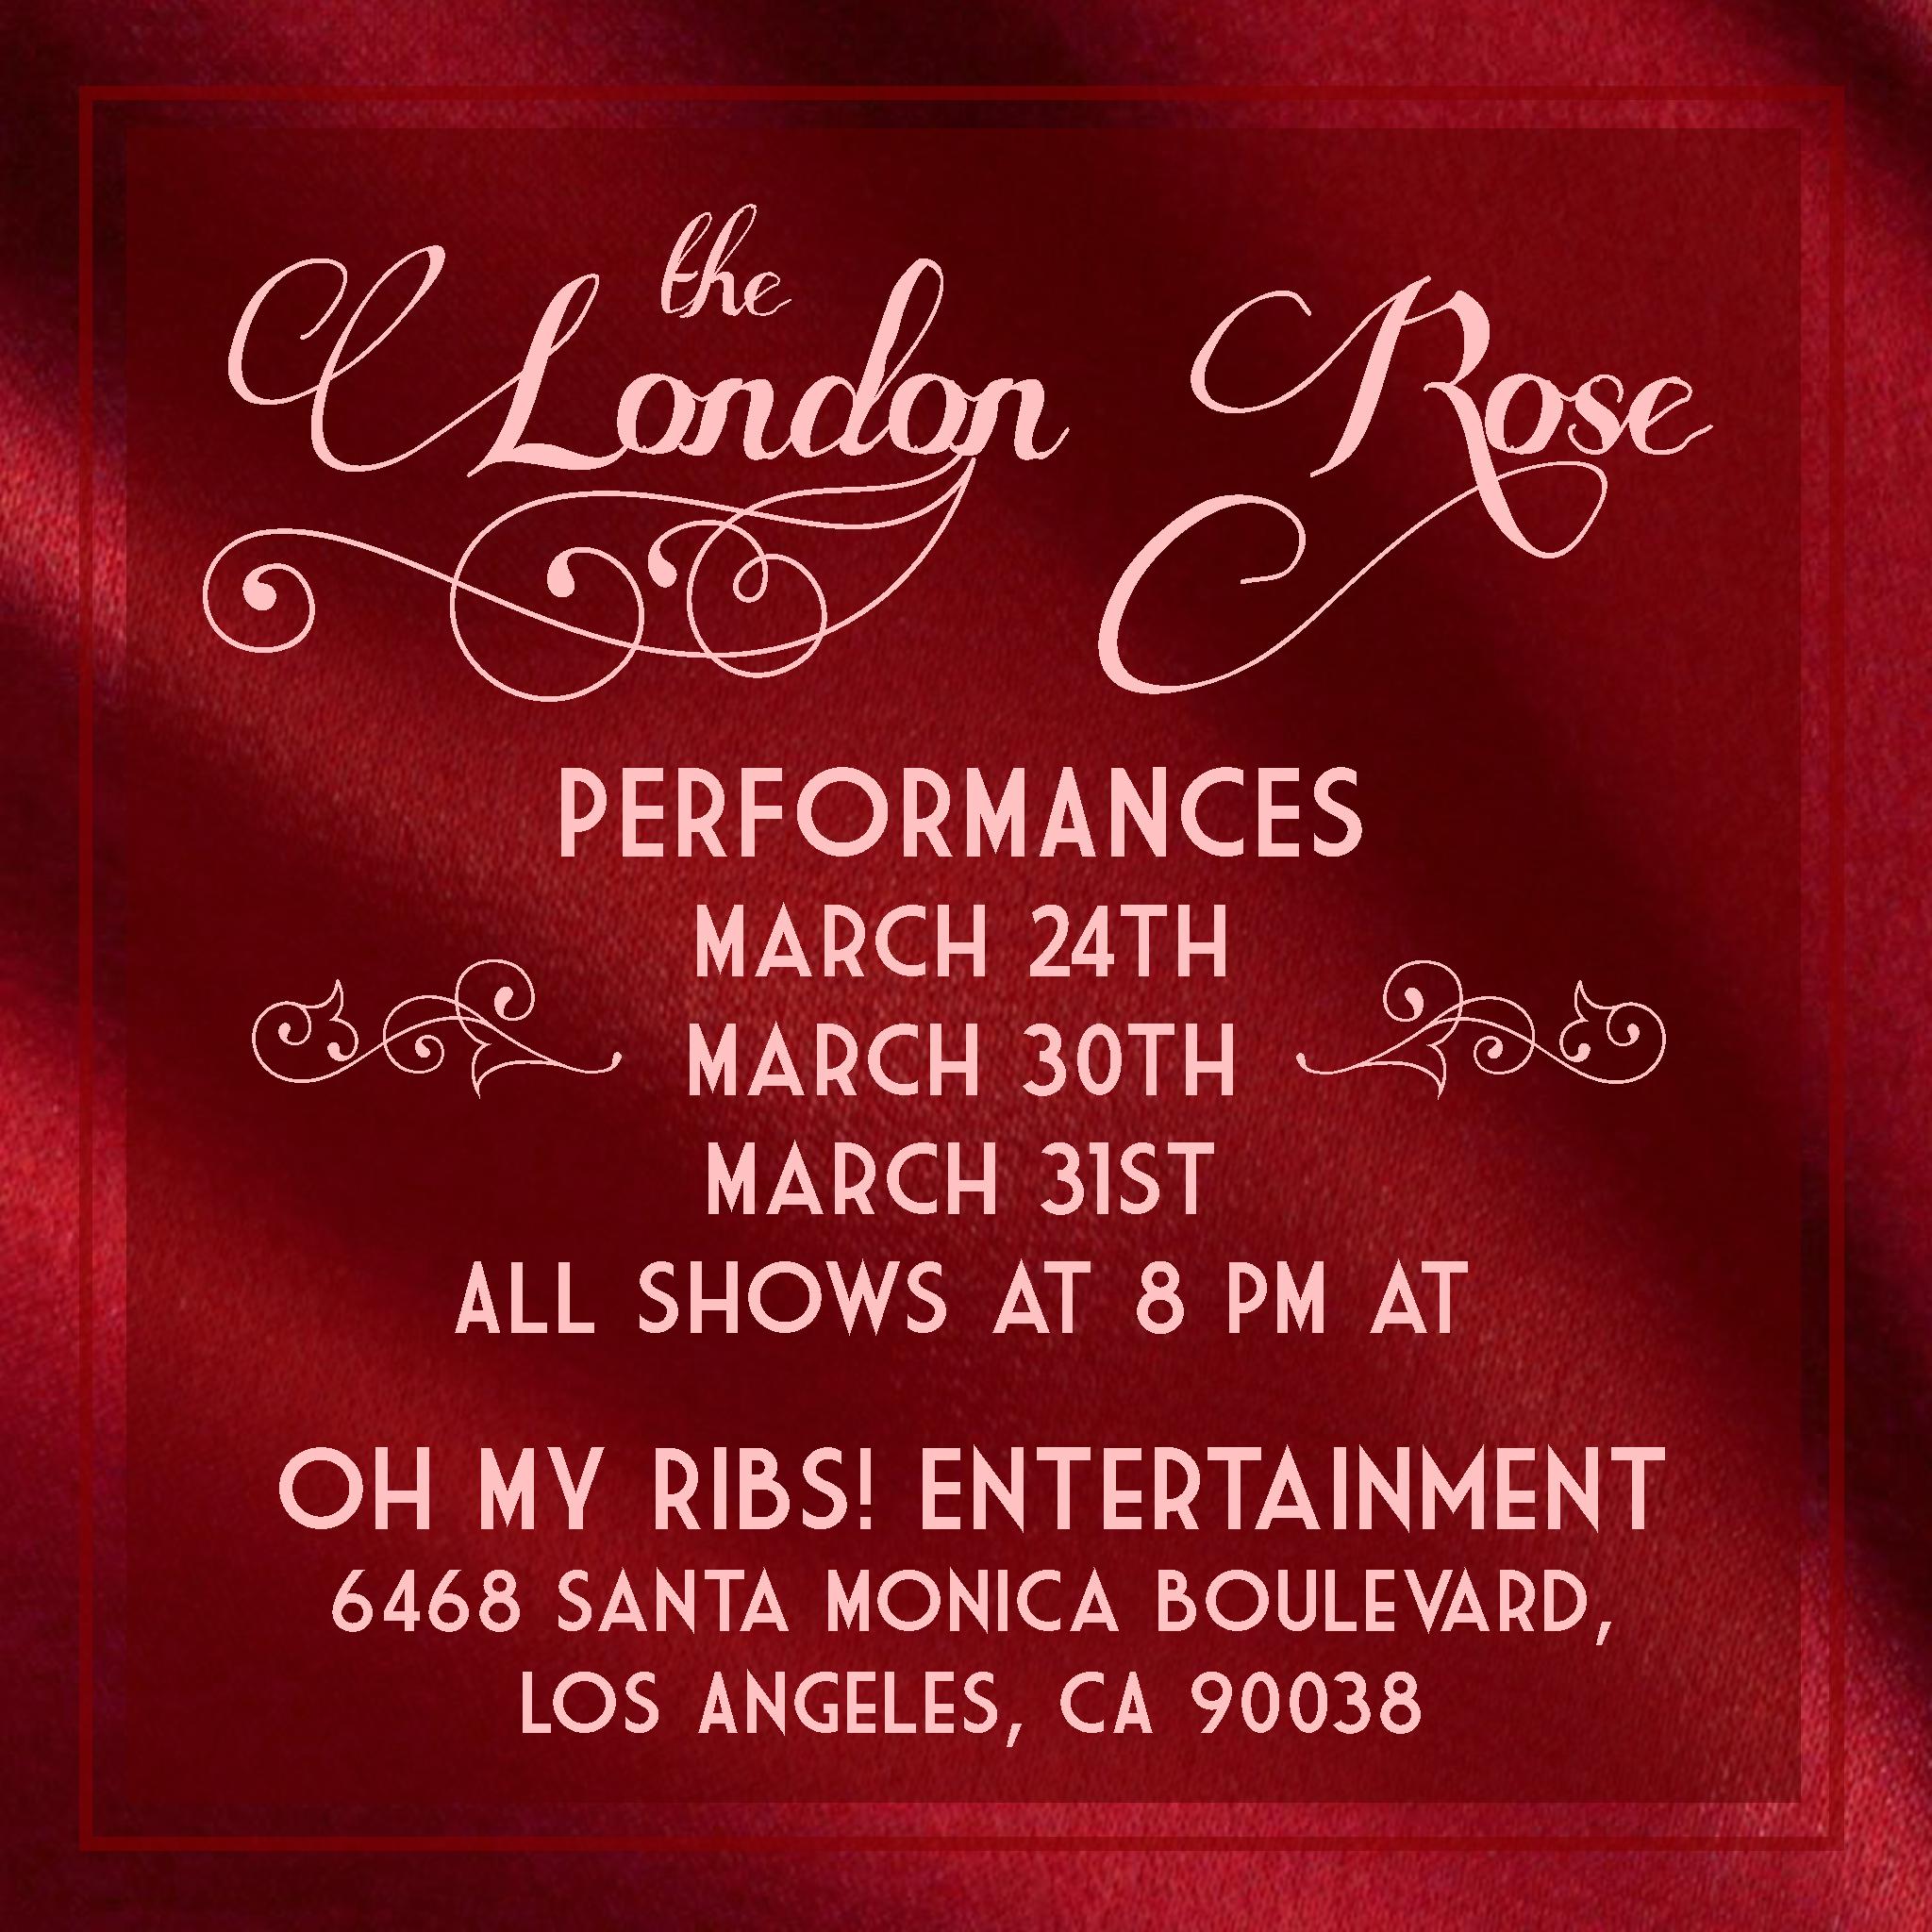 performance dates.jpg